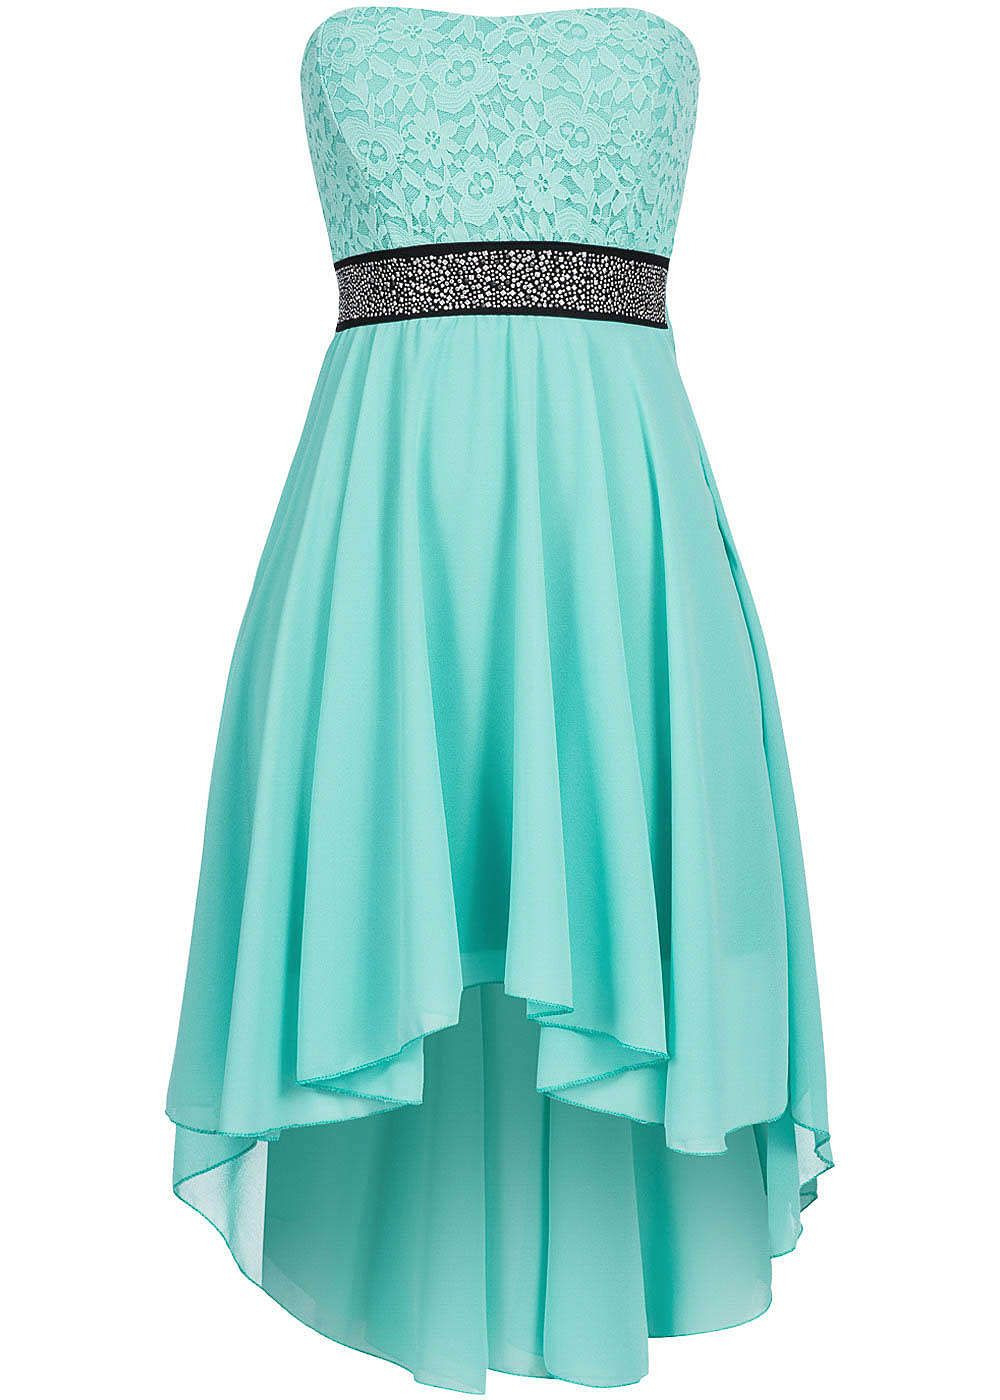 13 Top Blaue Kleider Damen SpezialgebietAbend Perfekt Blaue Kleider Damen Spezialgebiet